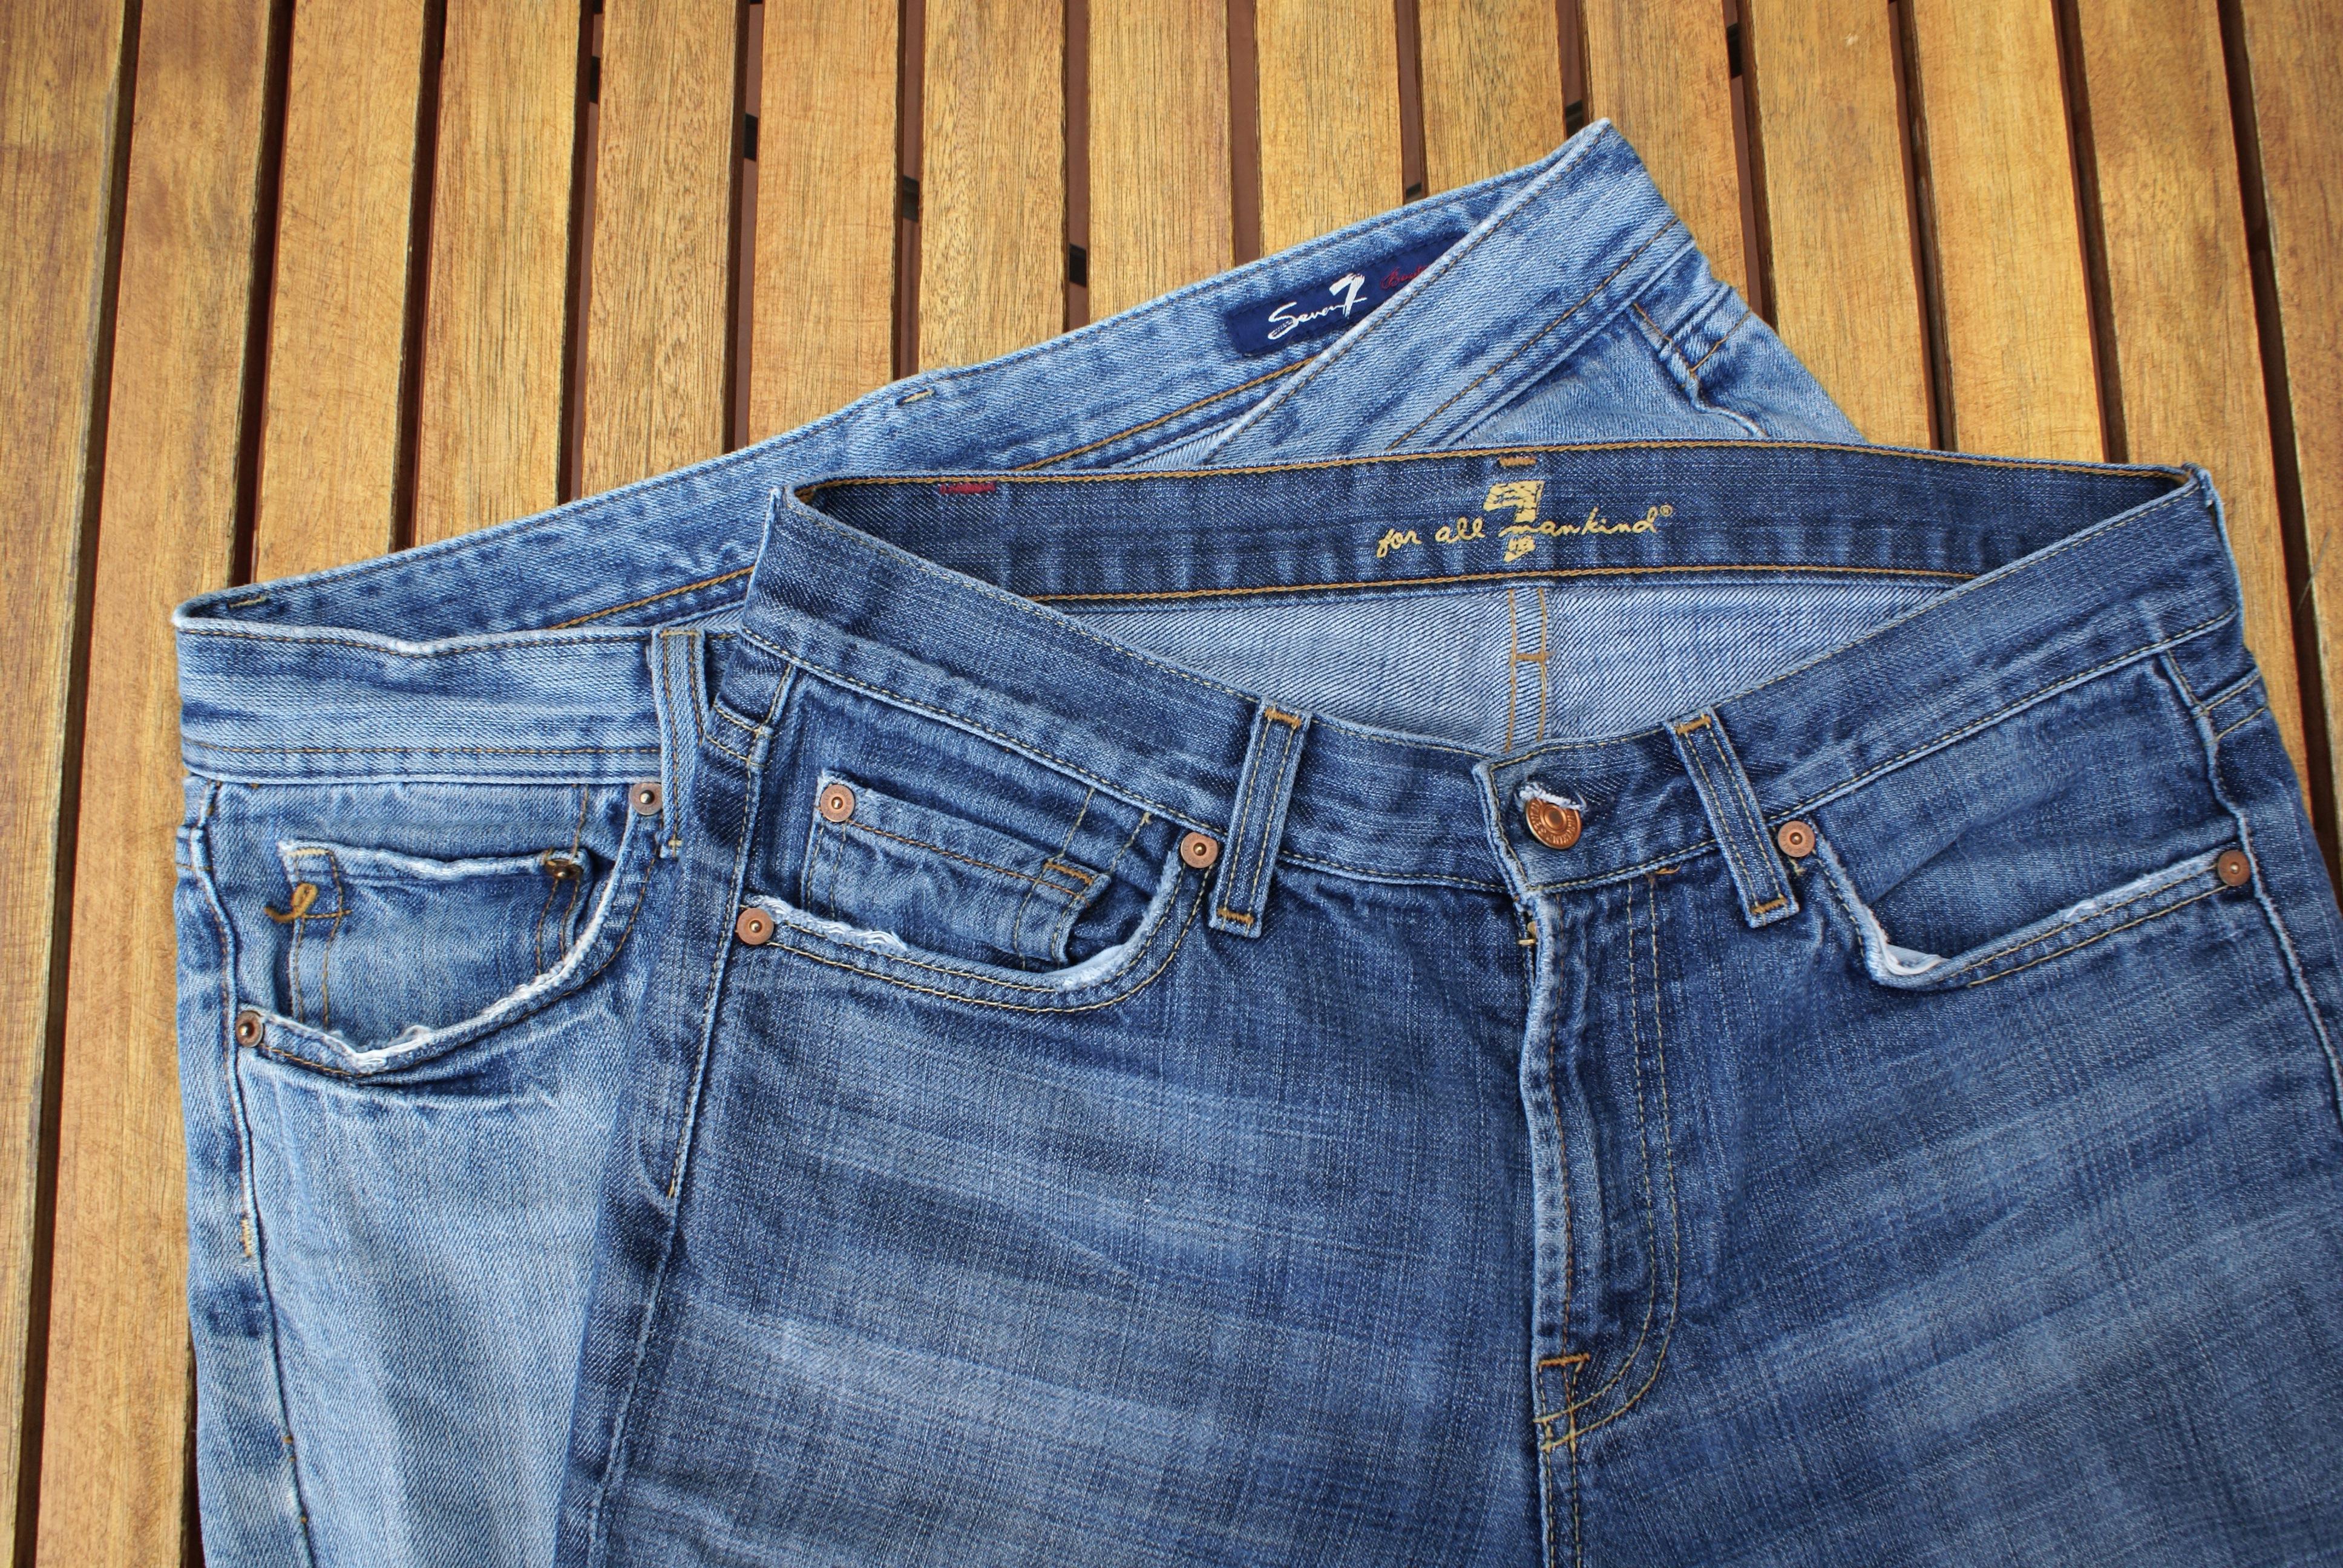 c57135313fa The Joy of Thrifting  10 Tips   Tricks - the thinking closet